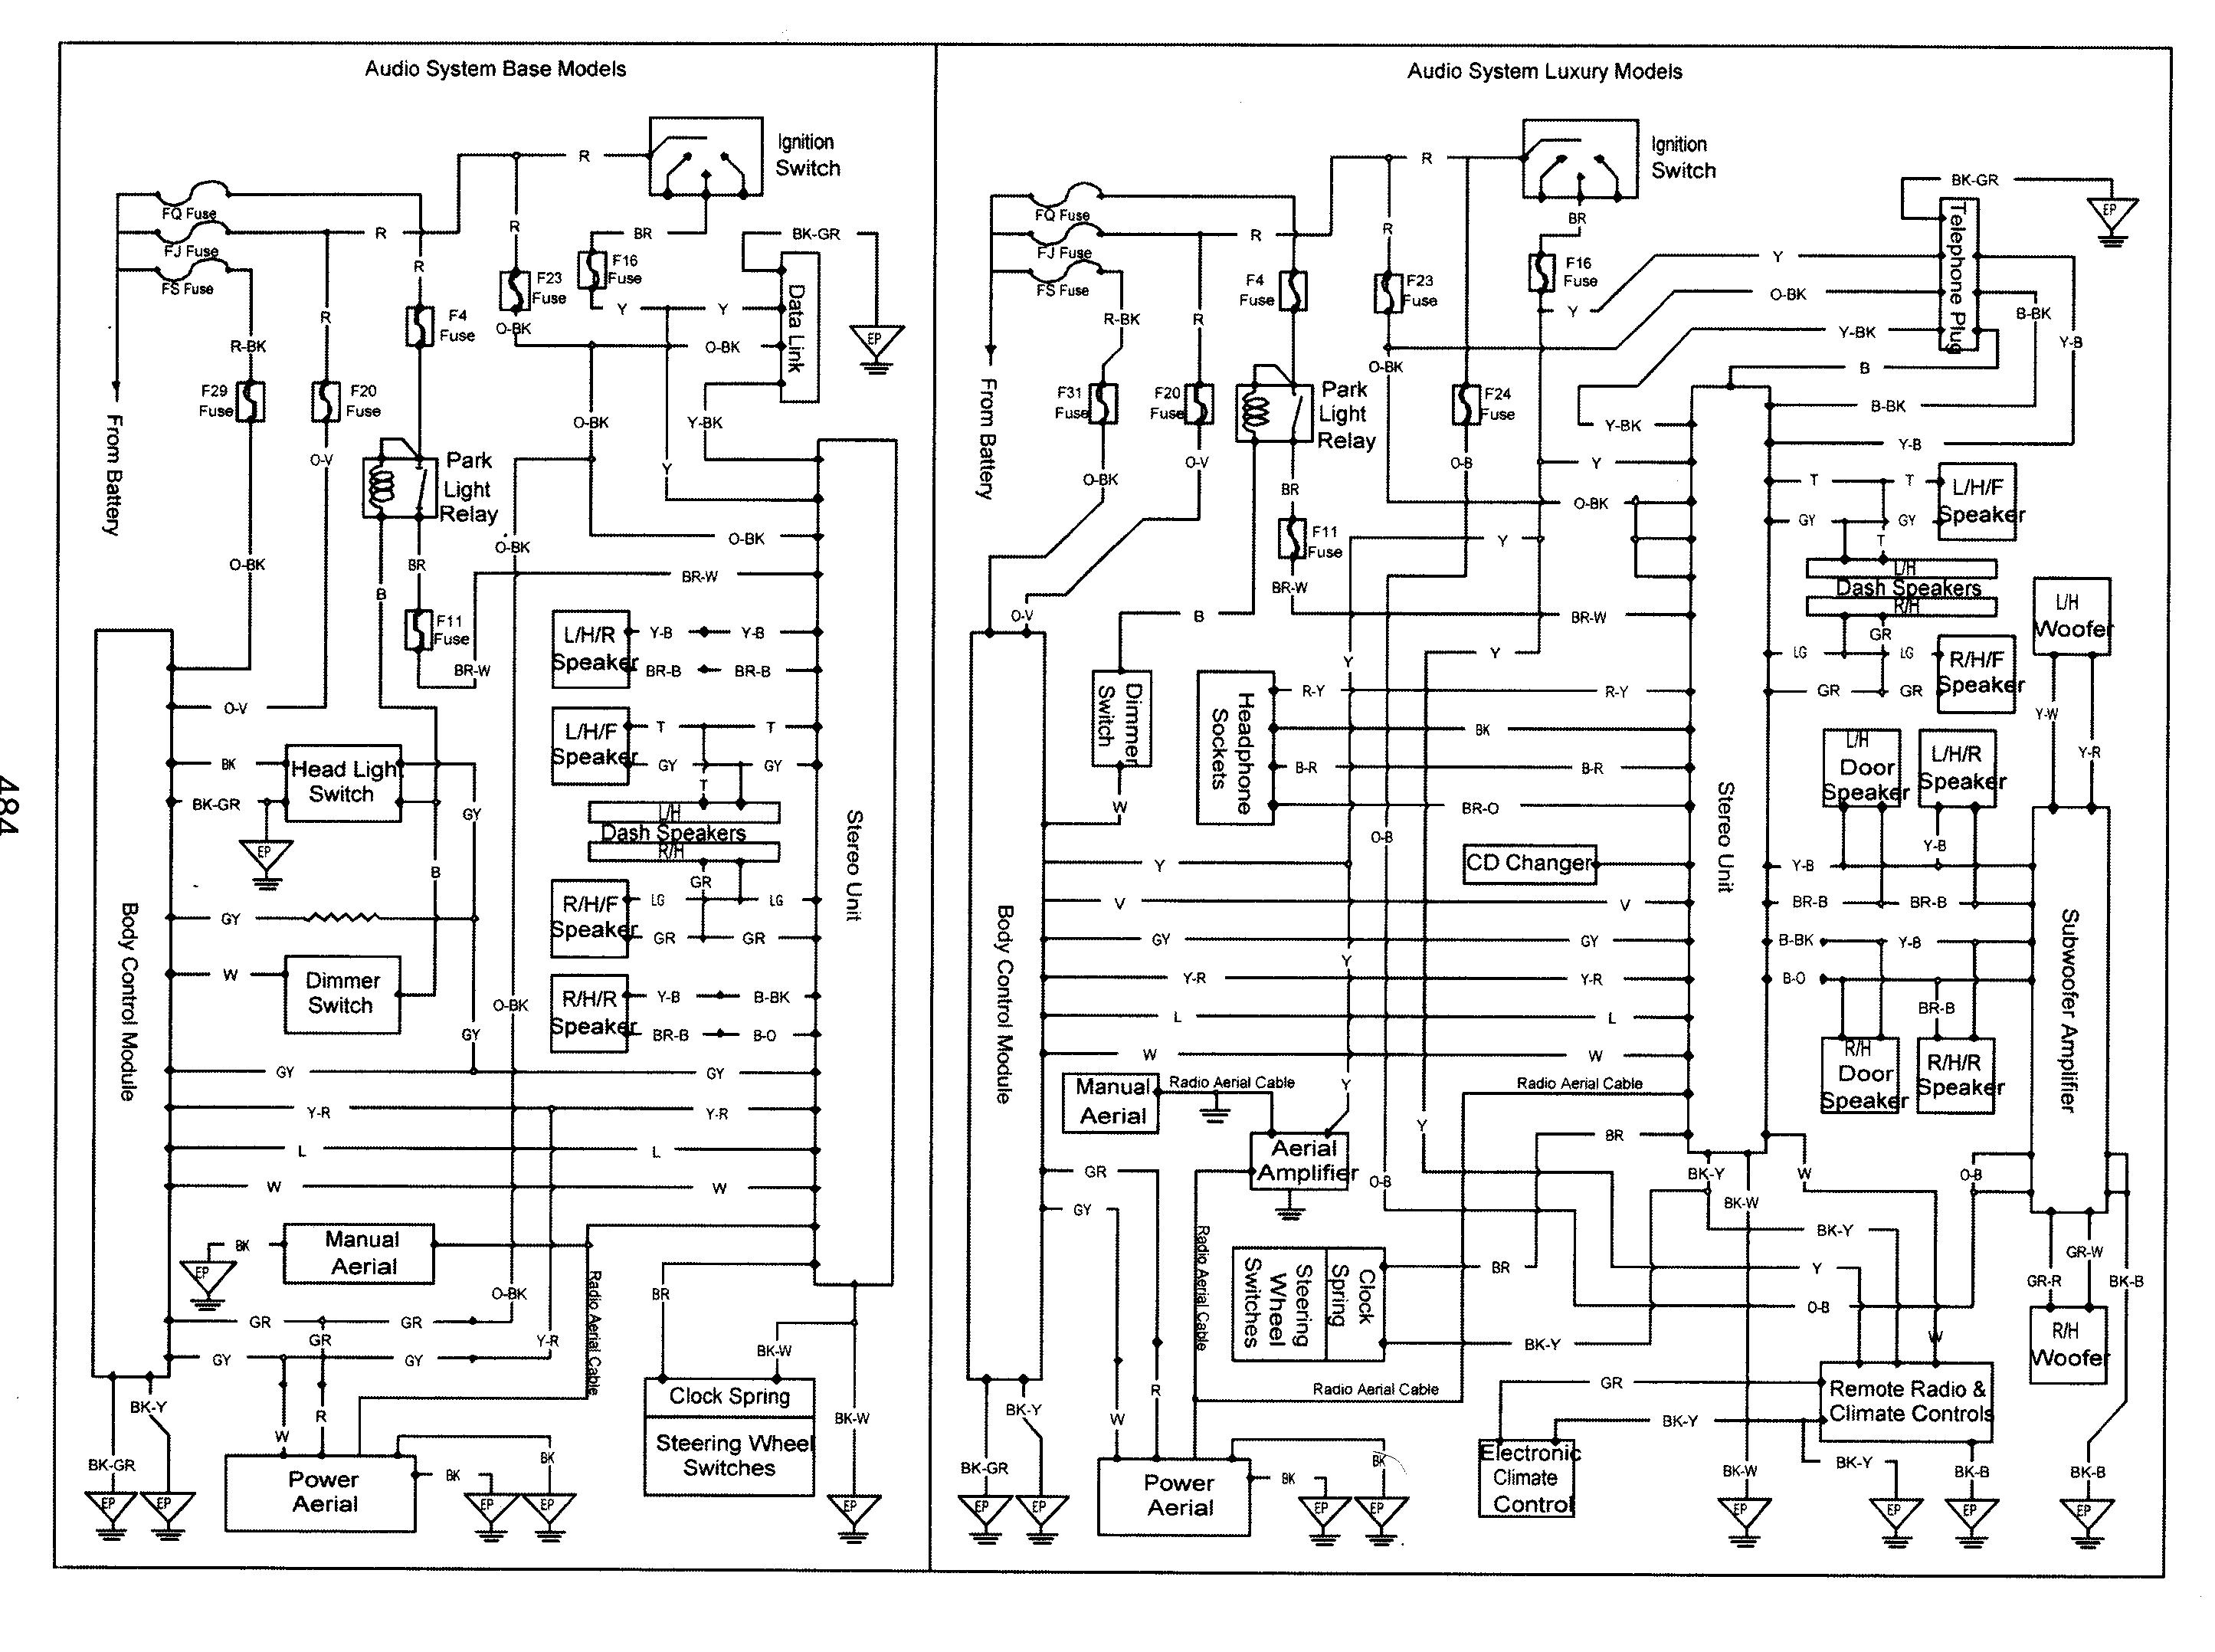 IMG_009?resize=665%2C496 lx torana tacho wiring diagram the best wiring diagram 2017 lx torana wiring diagram at crackthecode.co